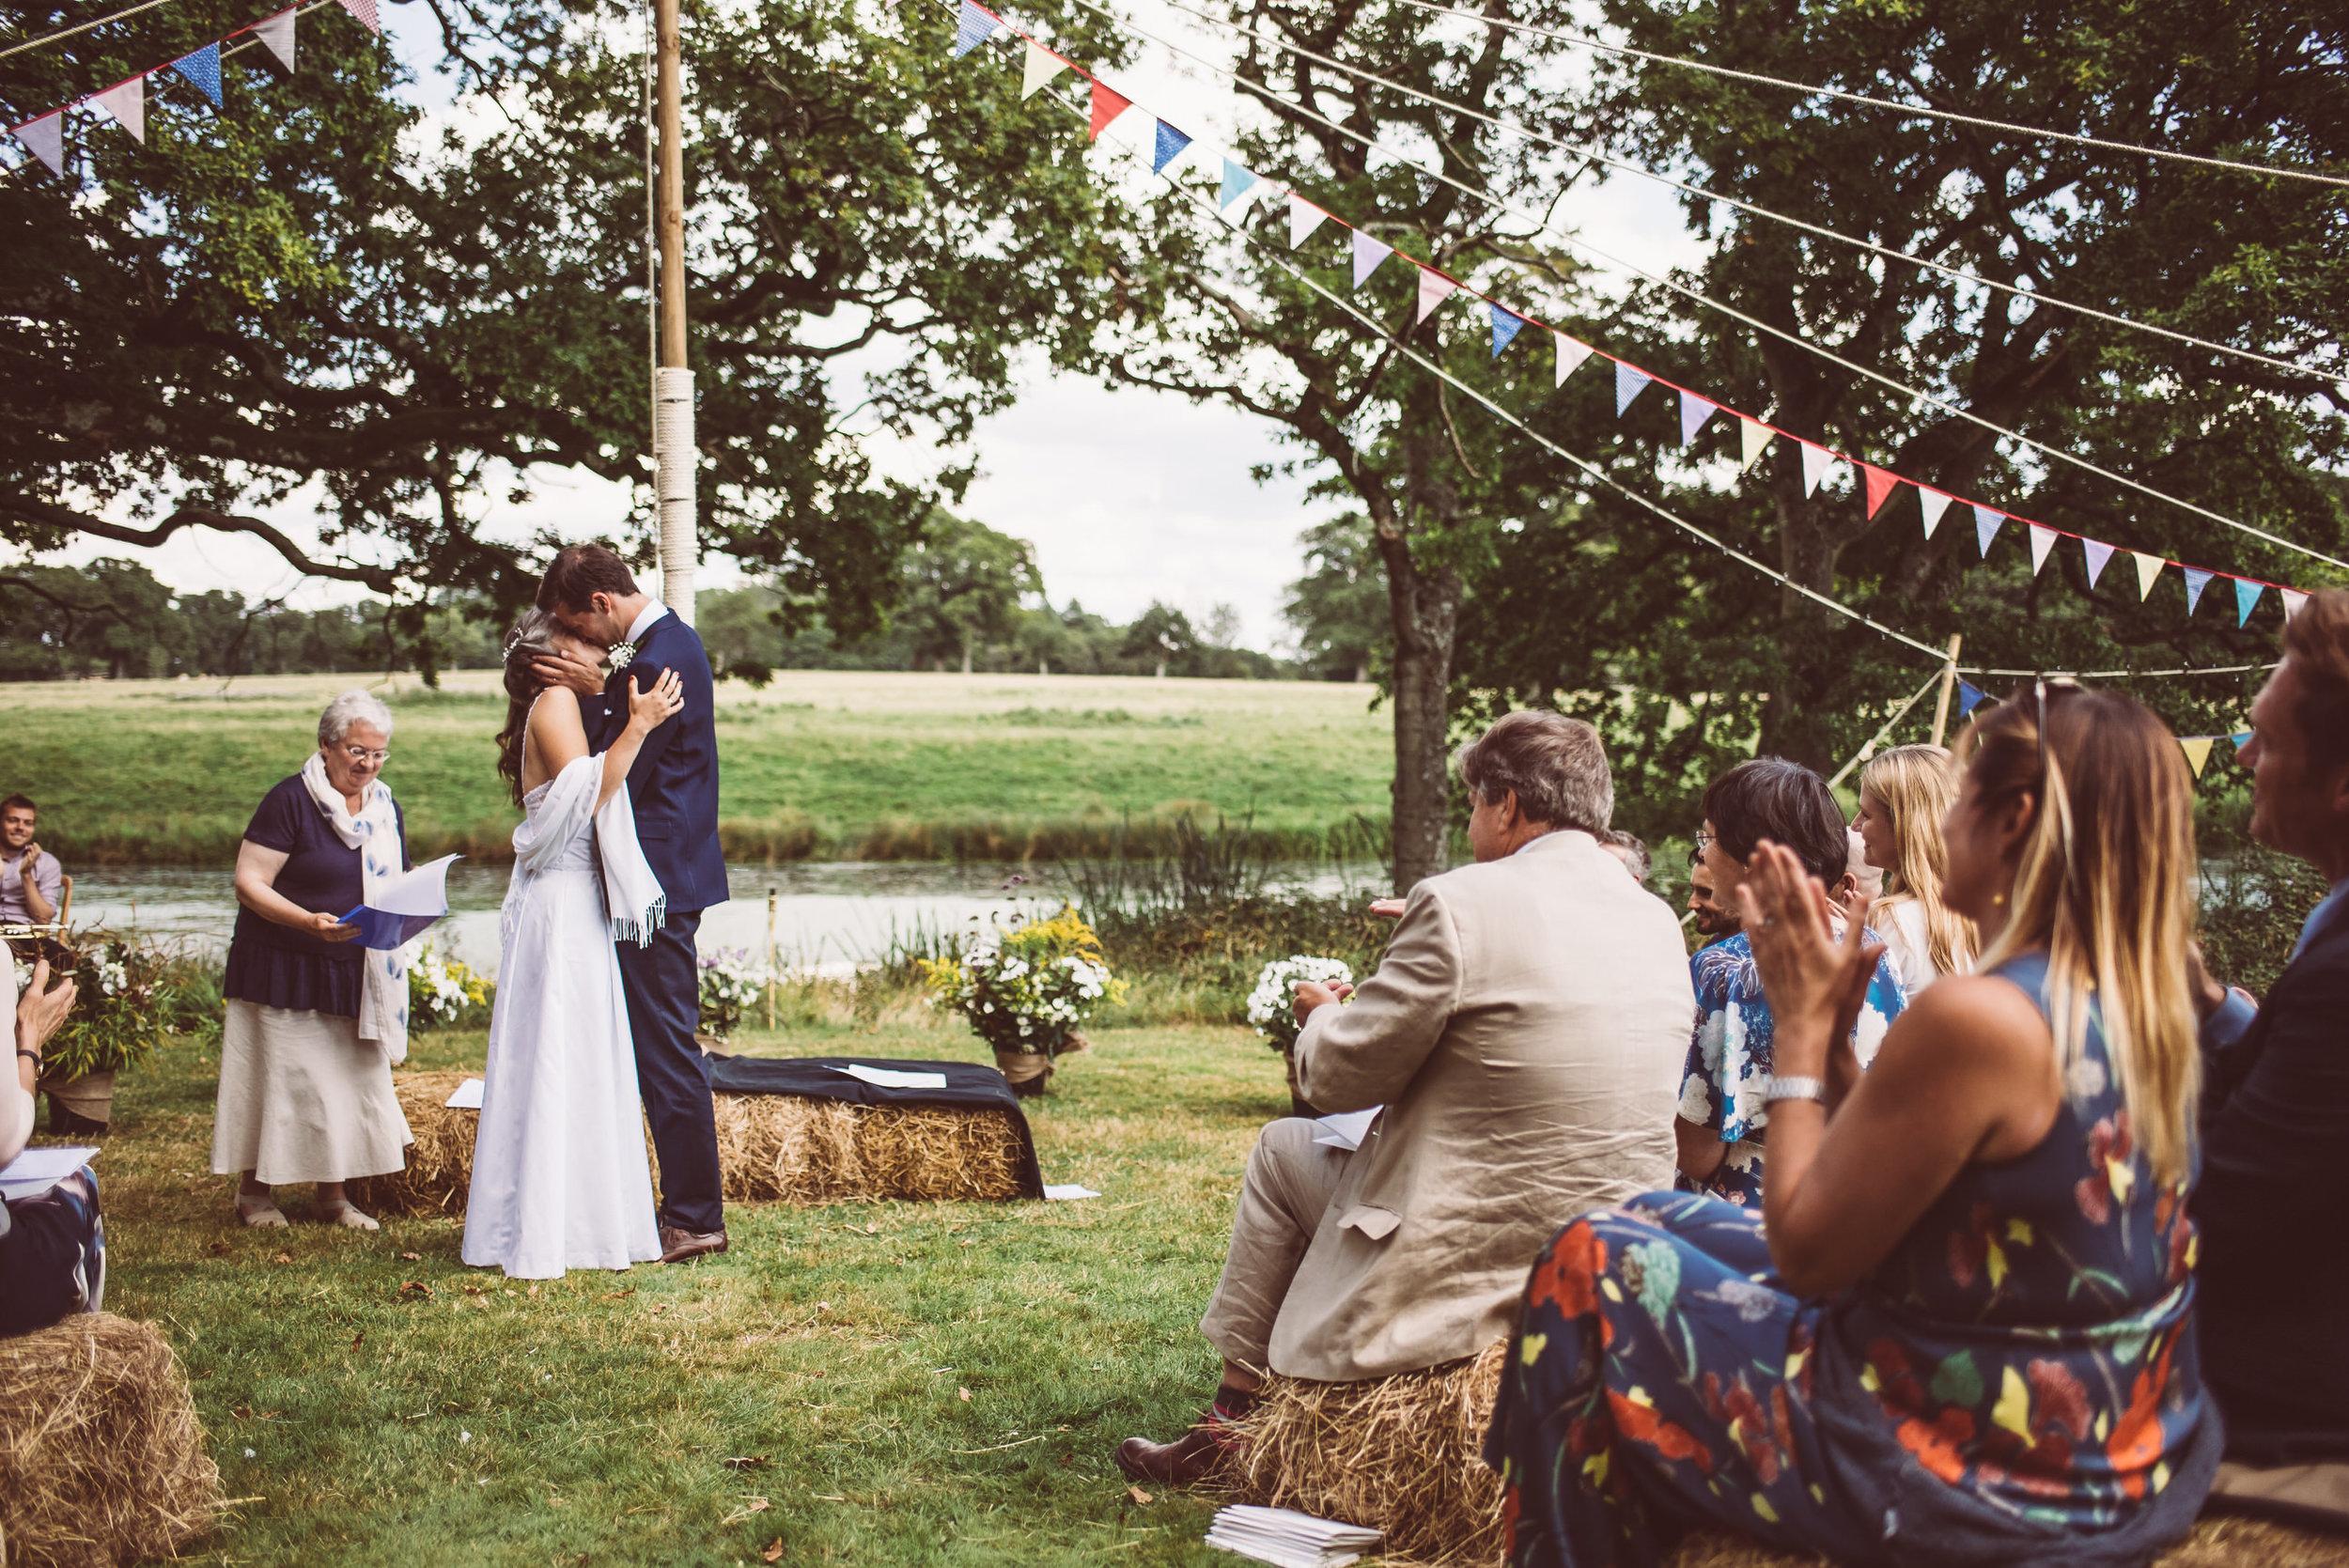 knepp-castle-boho-outdoor-wedding-252.jpg